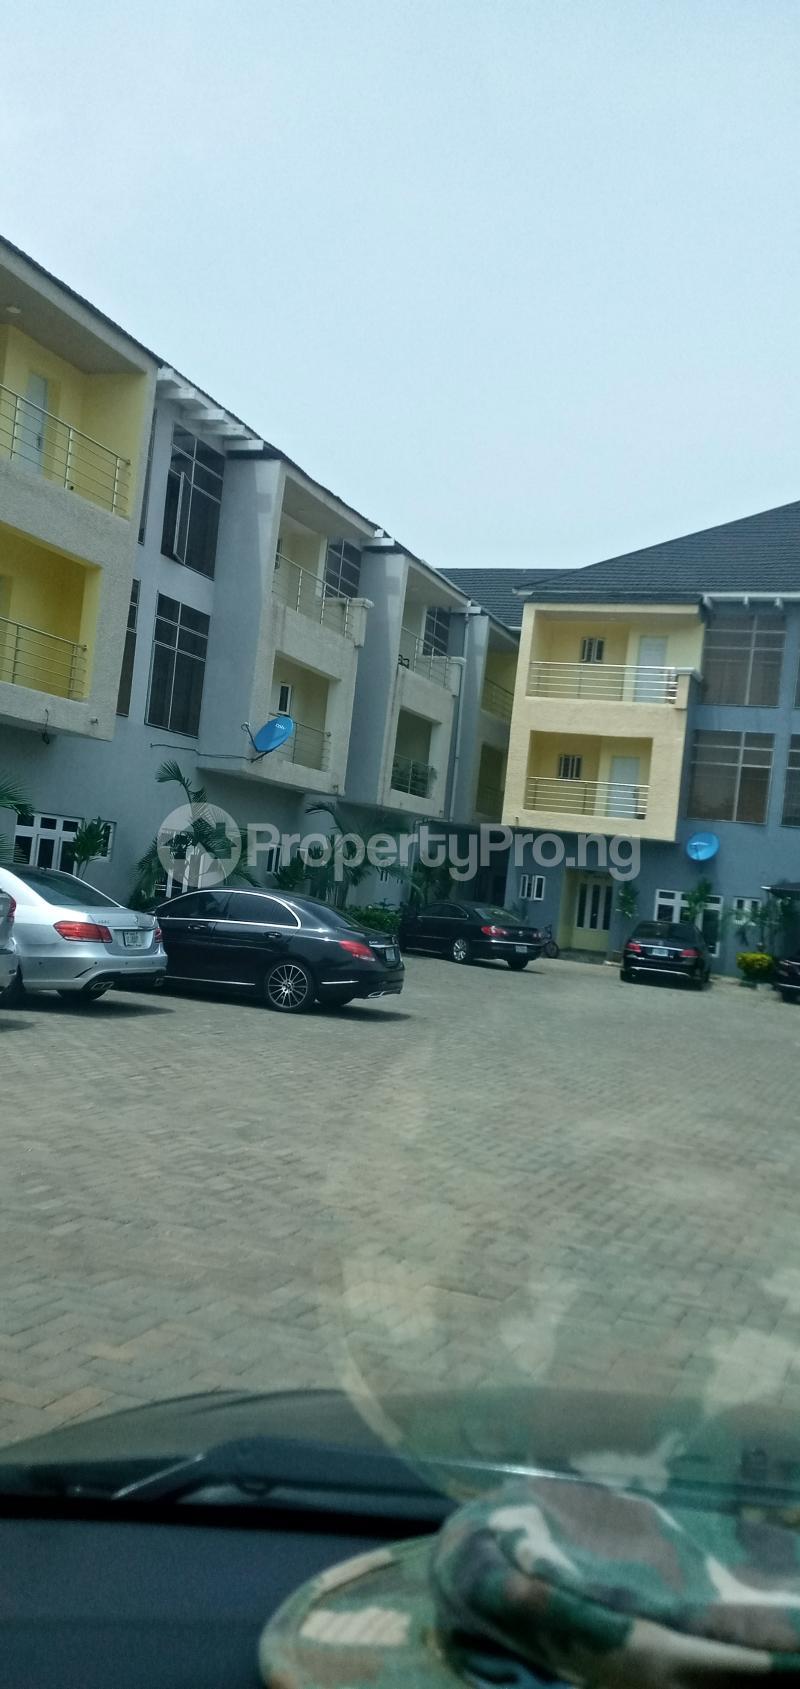 4 bedroom Terraced Duplex House for sale Close To Nnpc Guzape Guzape Abuja - 10